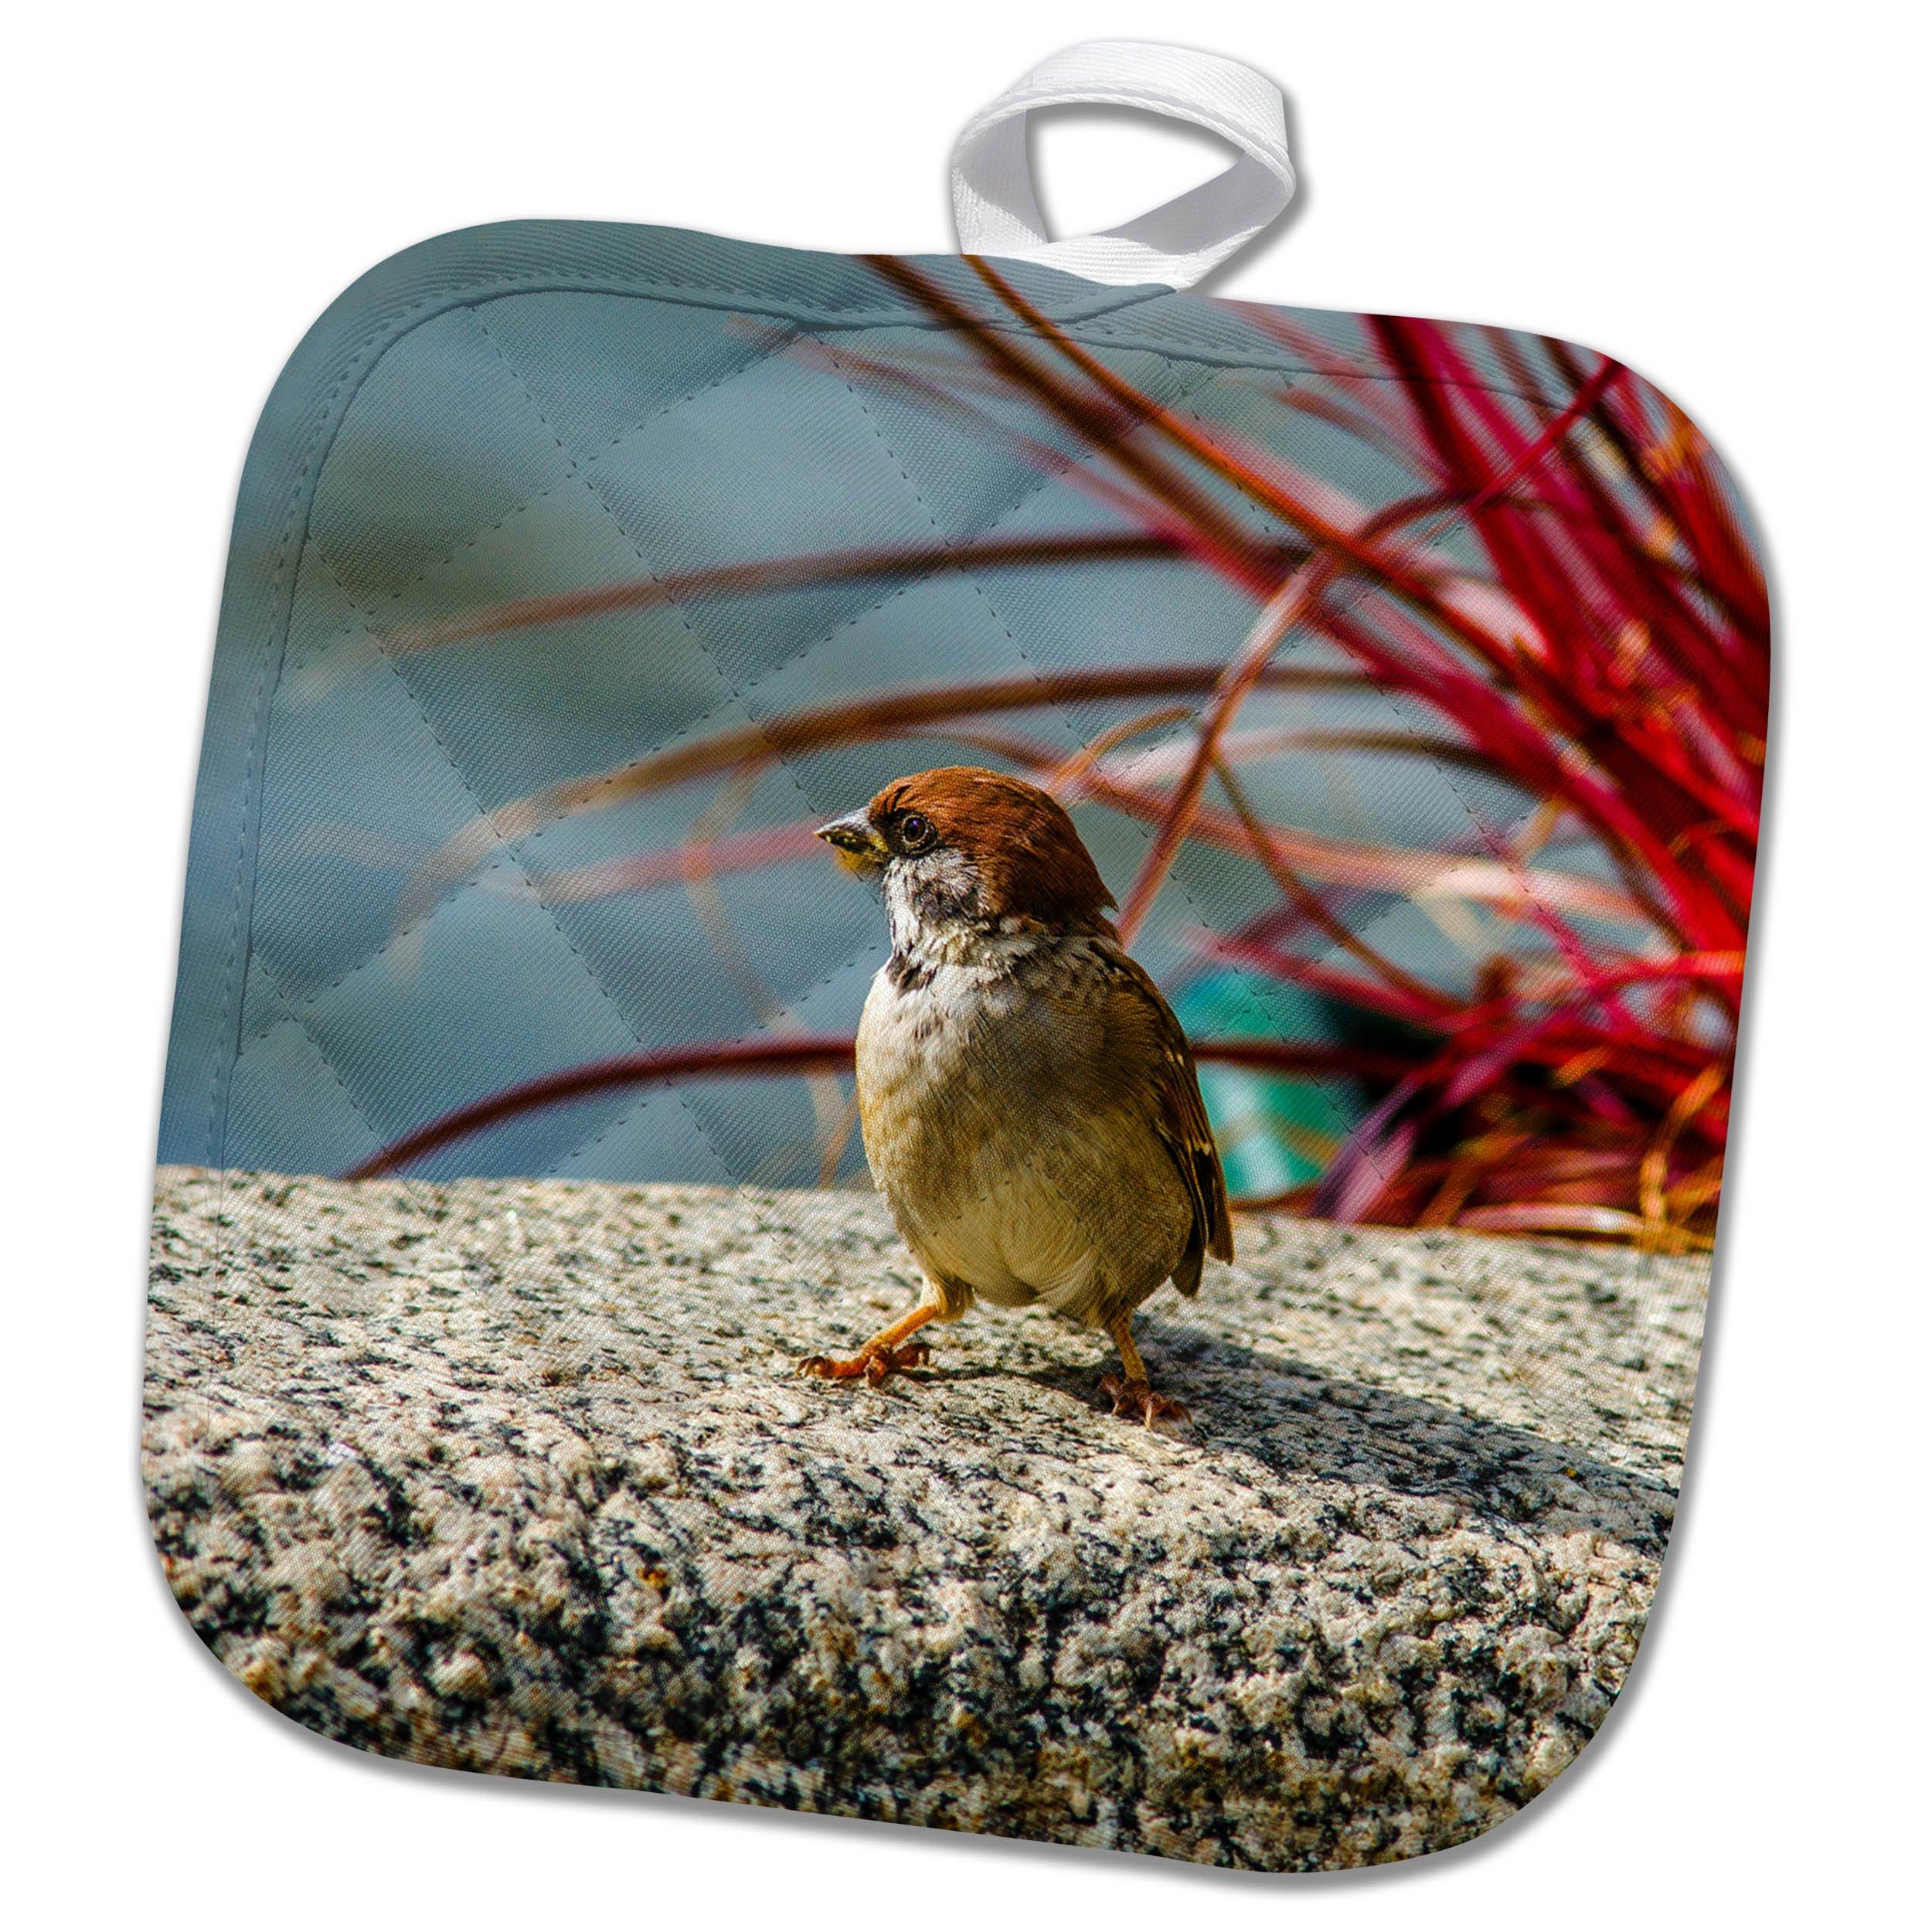 3dRose Alexis Photography - Birds - House sparrow by appearance. Eagle at heart - 8x8 Potholder (phl_267217_1)